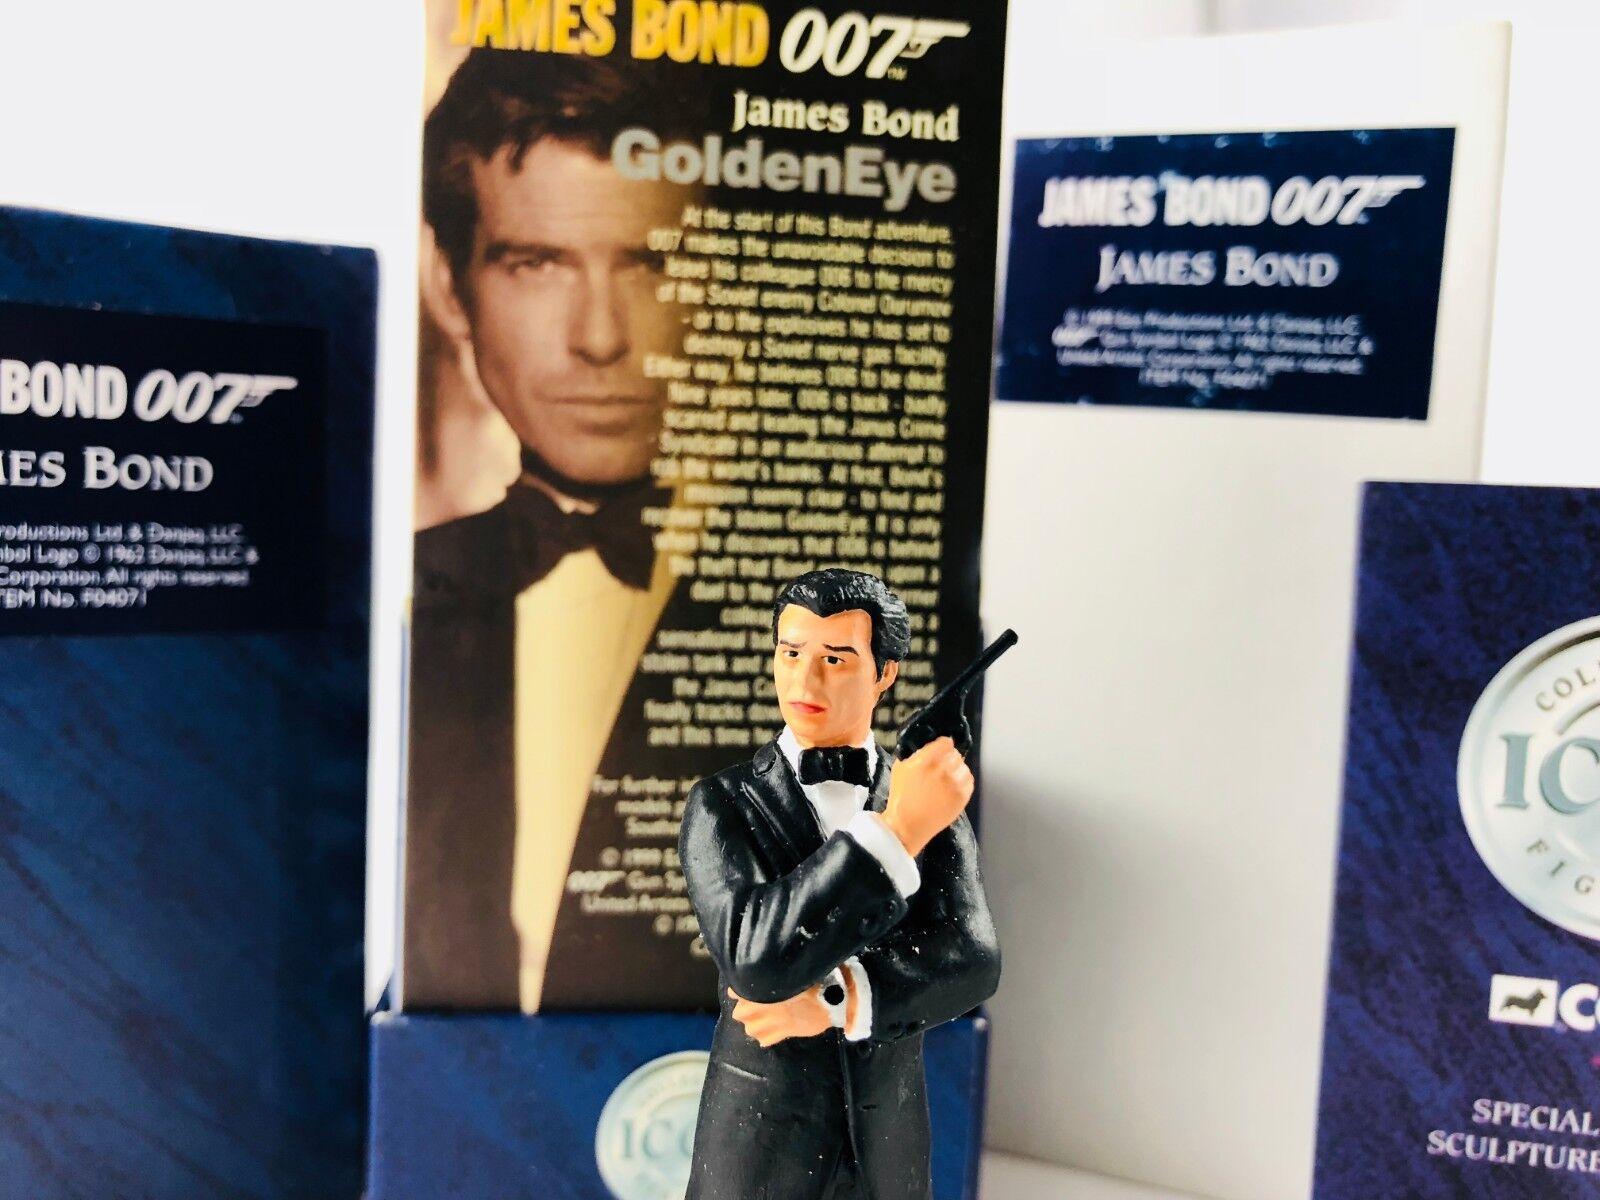 JAMES BOND CORGI ICON 007 PIERCE BROSNAN 1st EDITION FIGURE